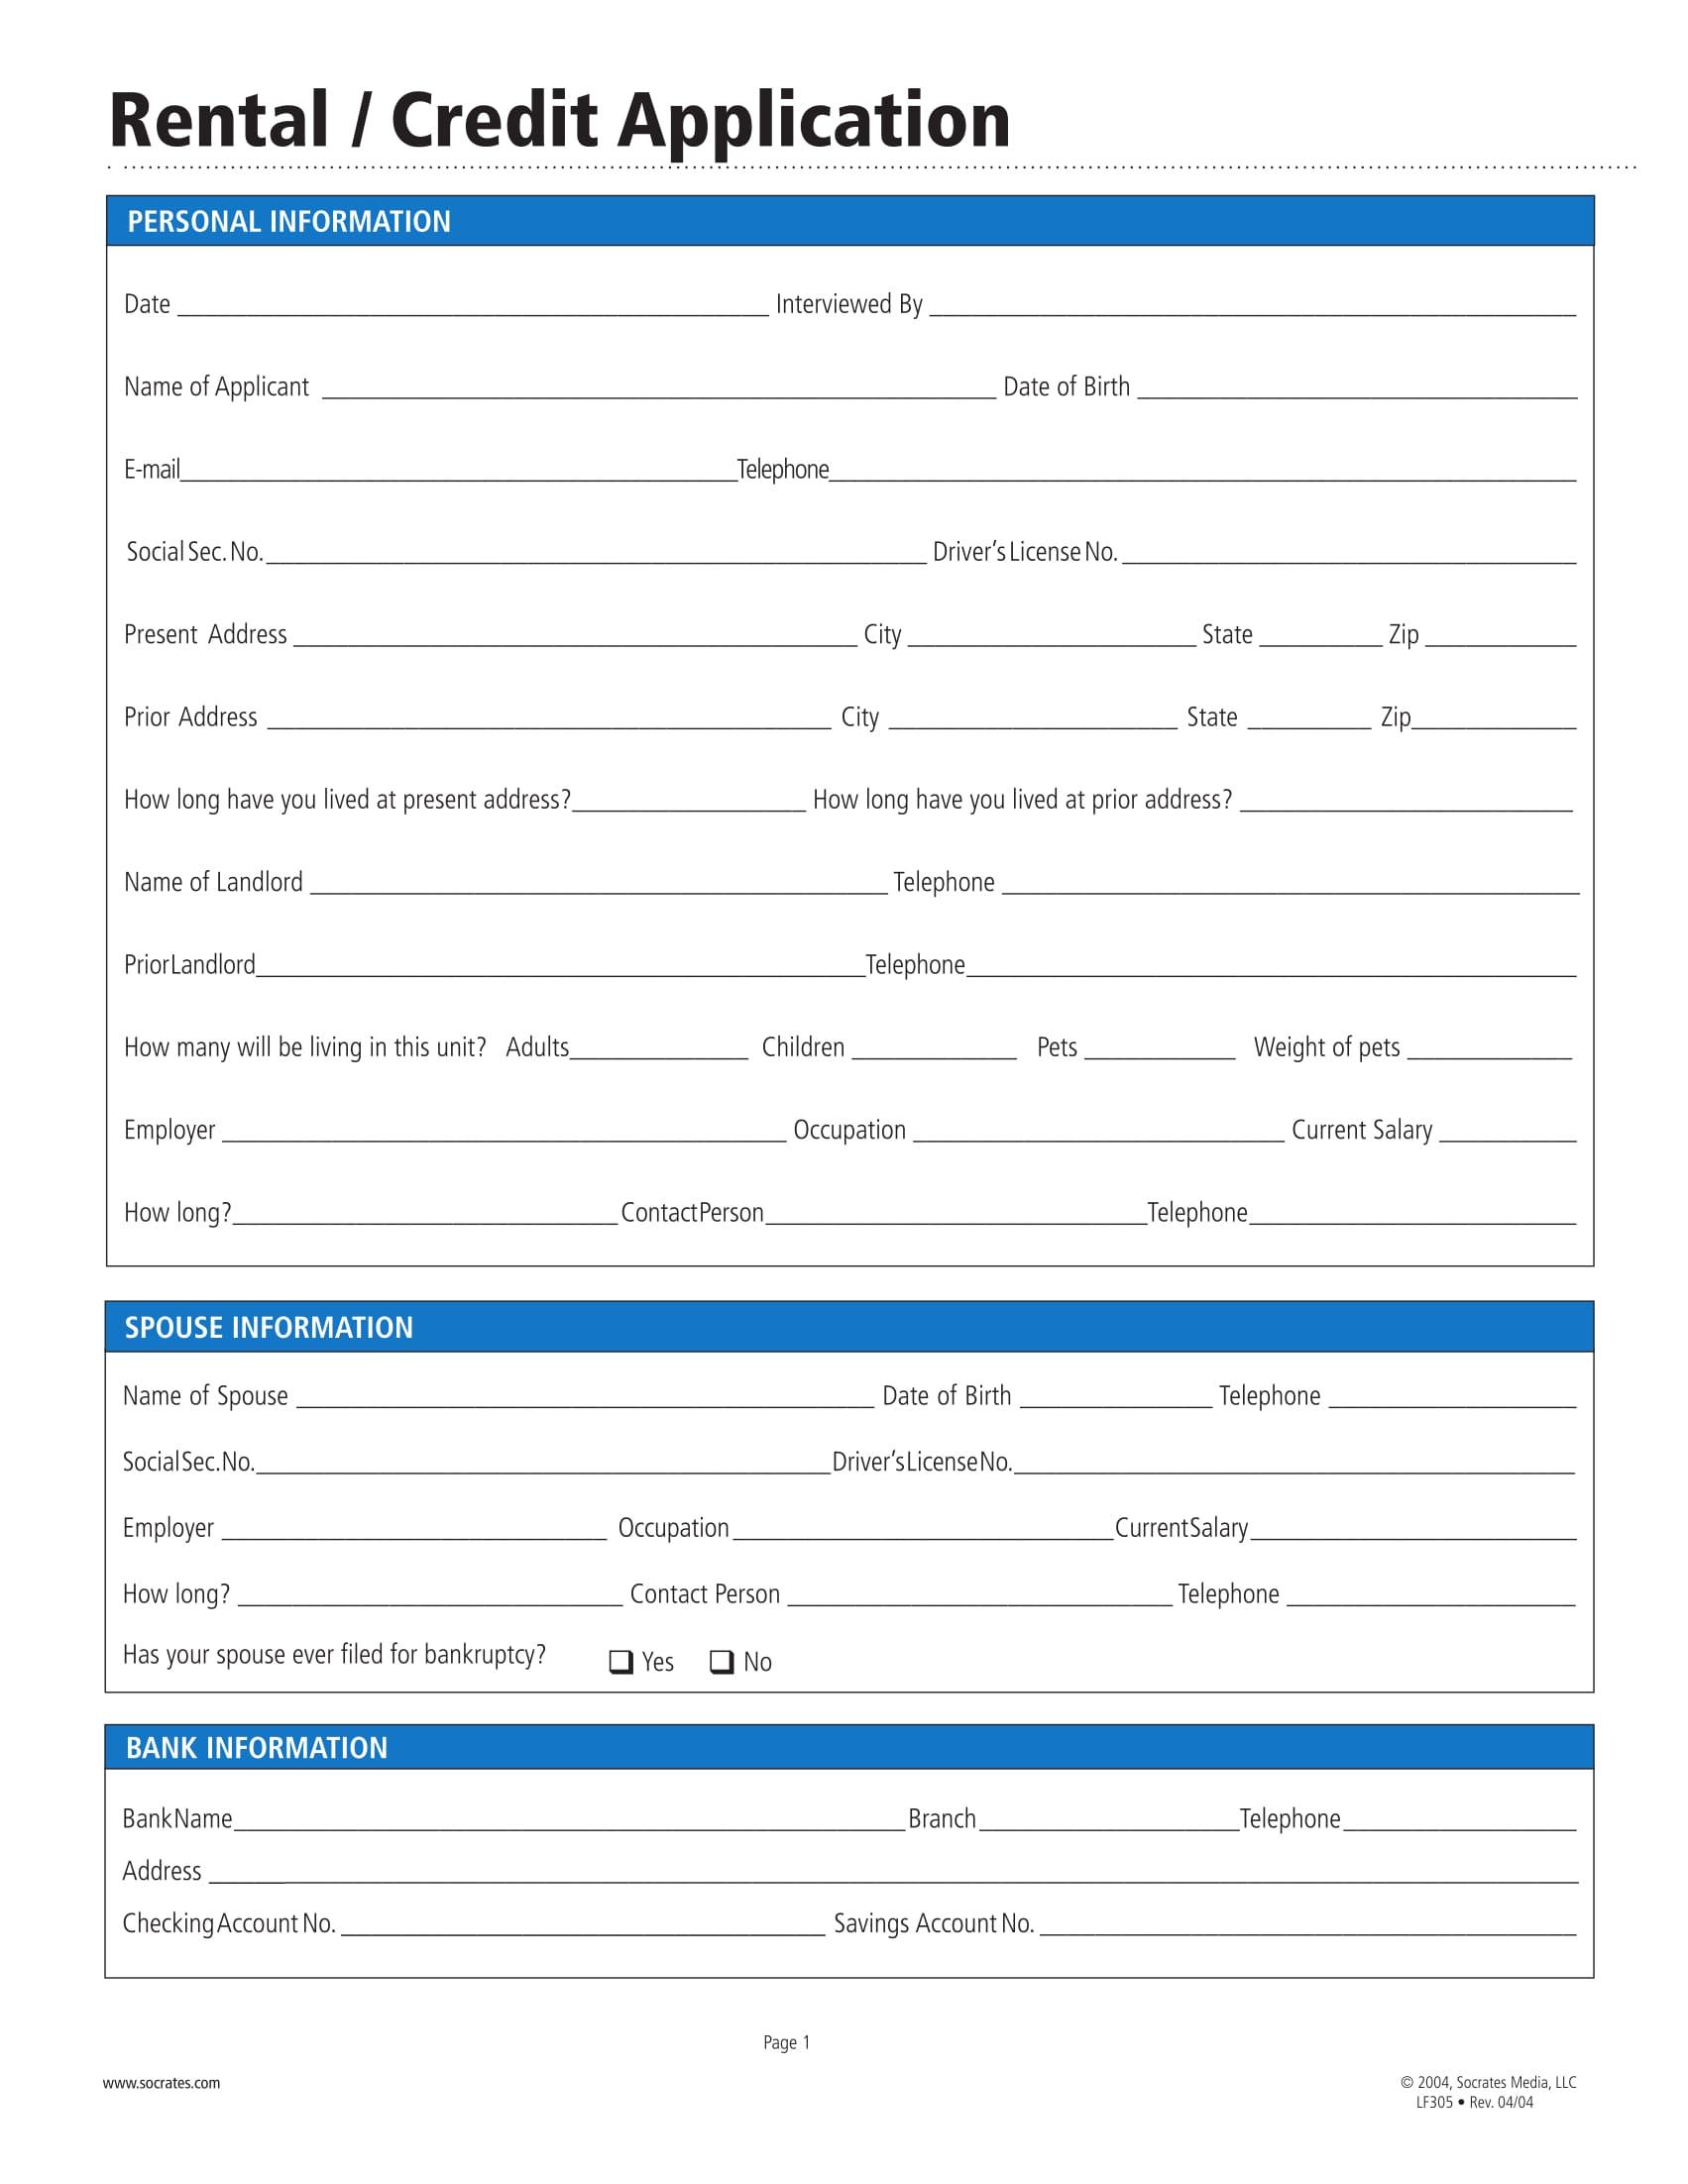 rental or credit application report 1